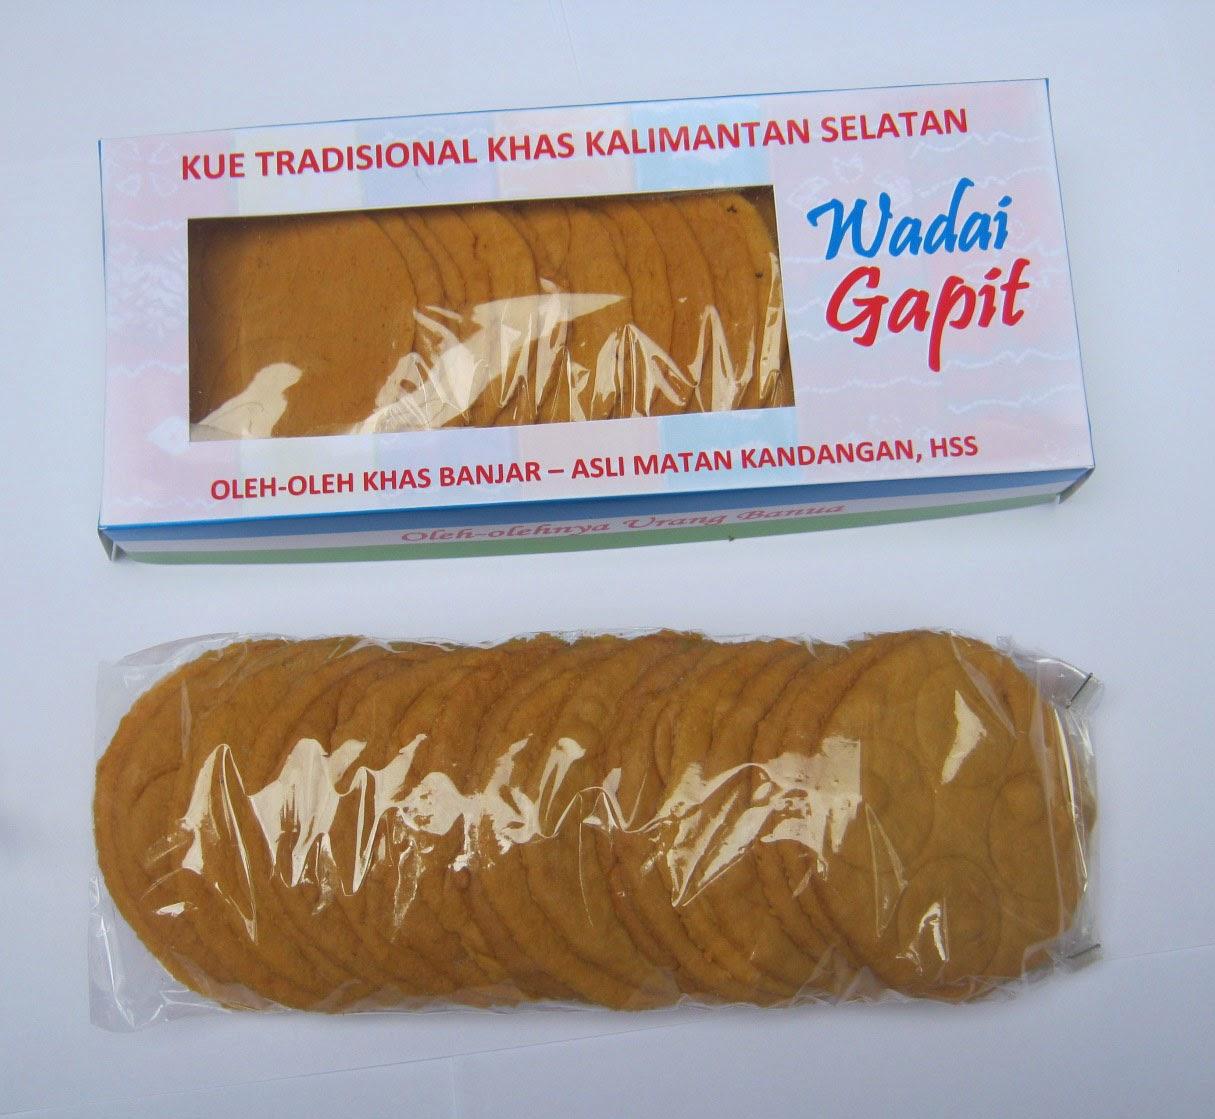 Kue Tradisional Kalimantan Selatan